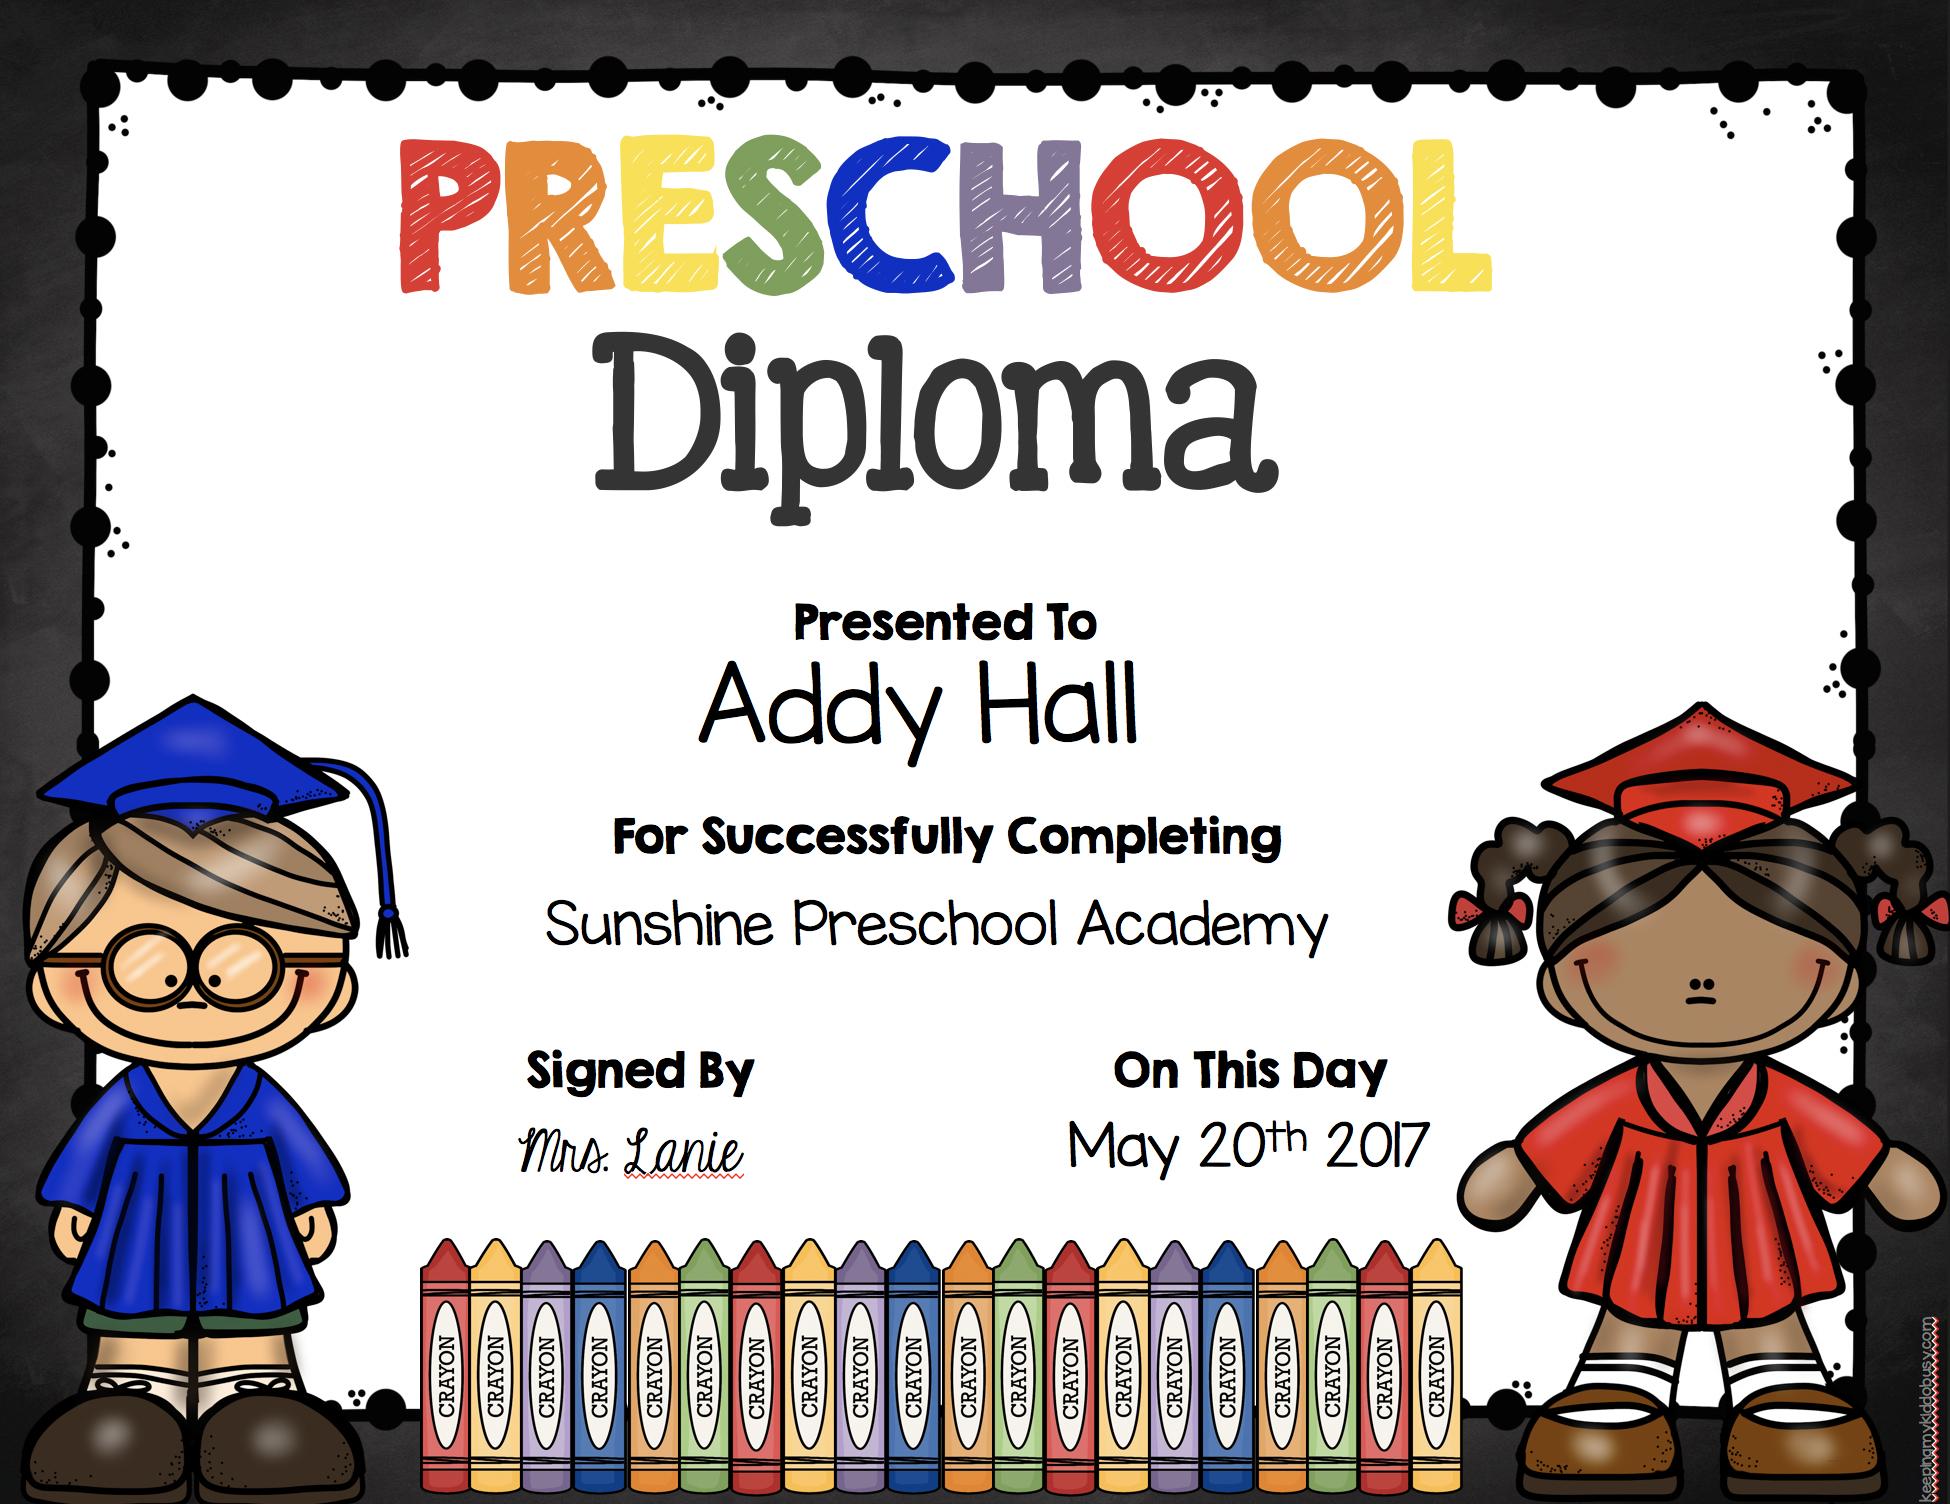 off sale graduation. Diploma clipart preschool